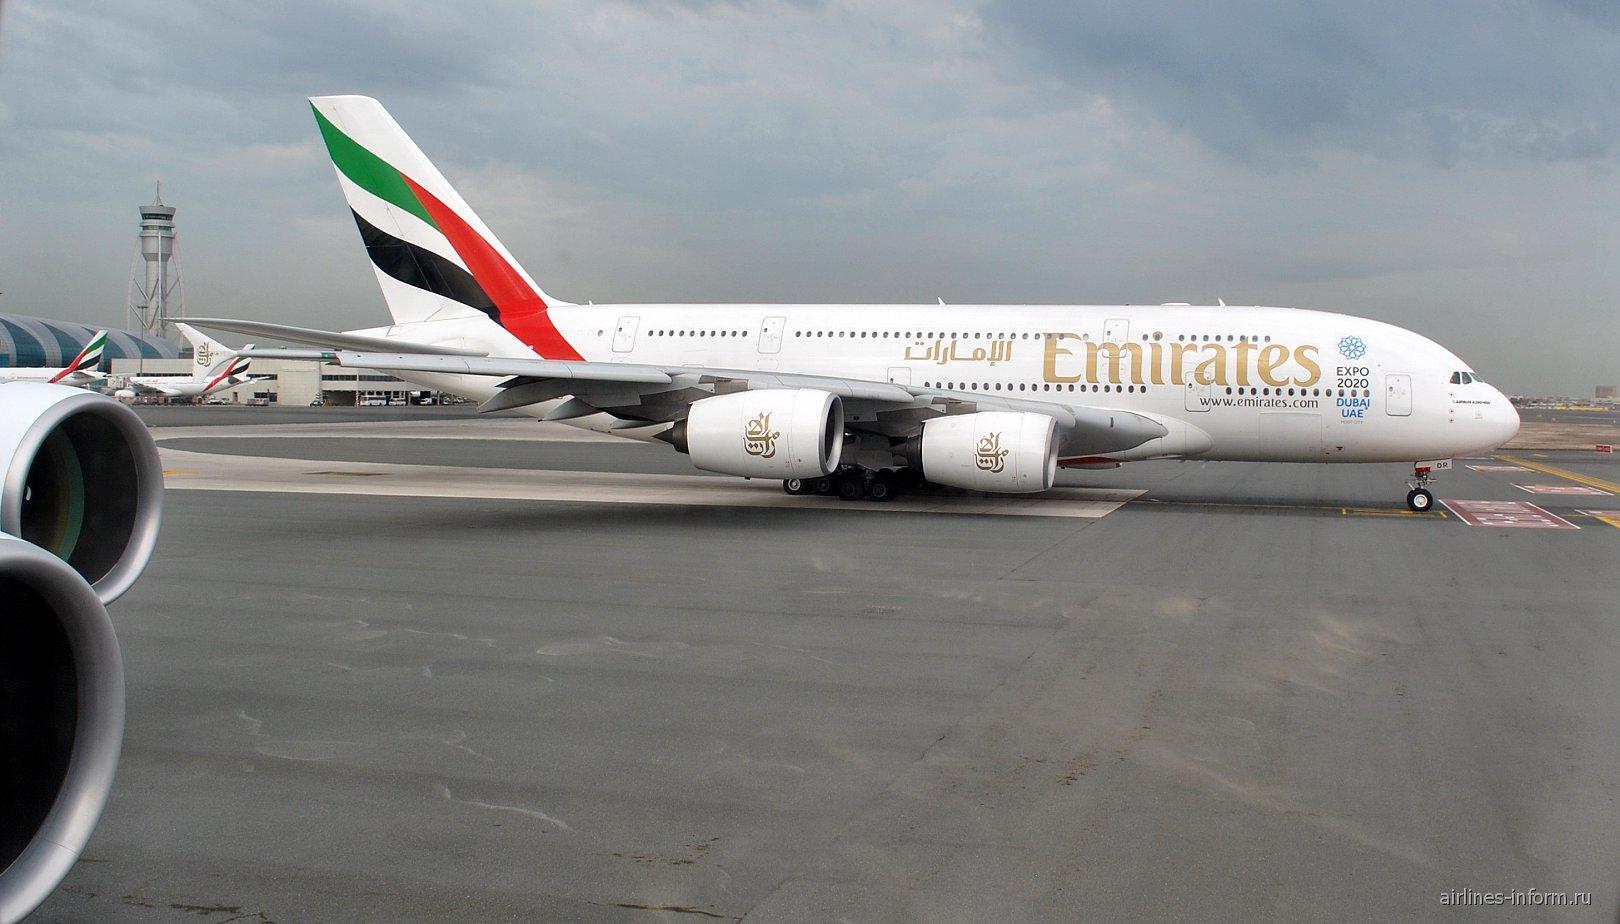 Airbus A380 авиакомпании Emirates в аэропорту Дубай